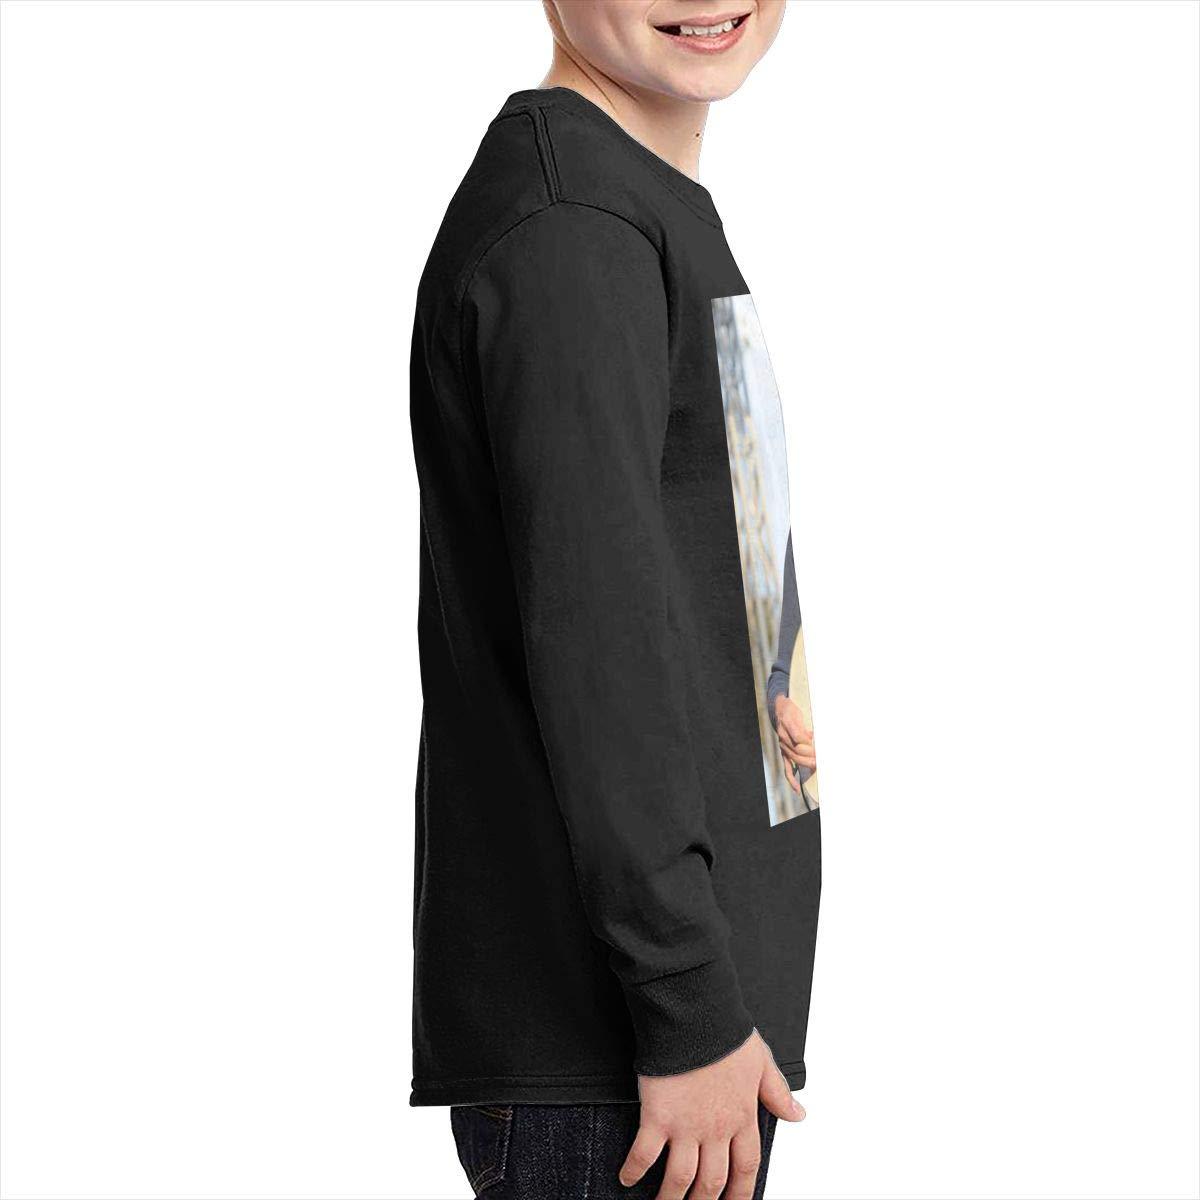 RhteGui Buckethead Boys /& Girls Junior Vintage Long Sleeve T-Shirt Black